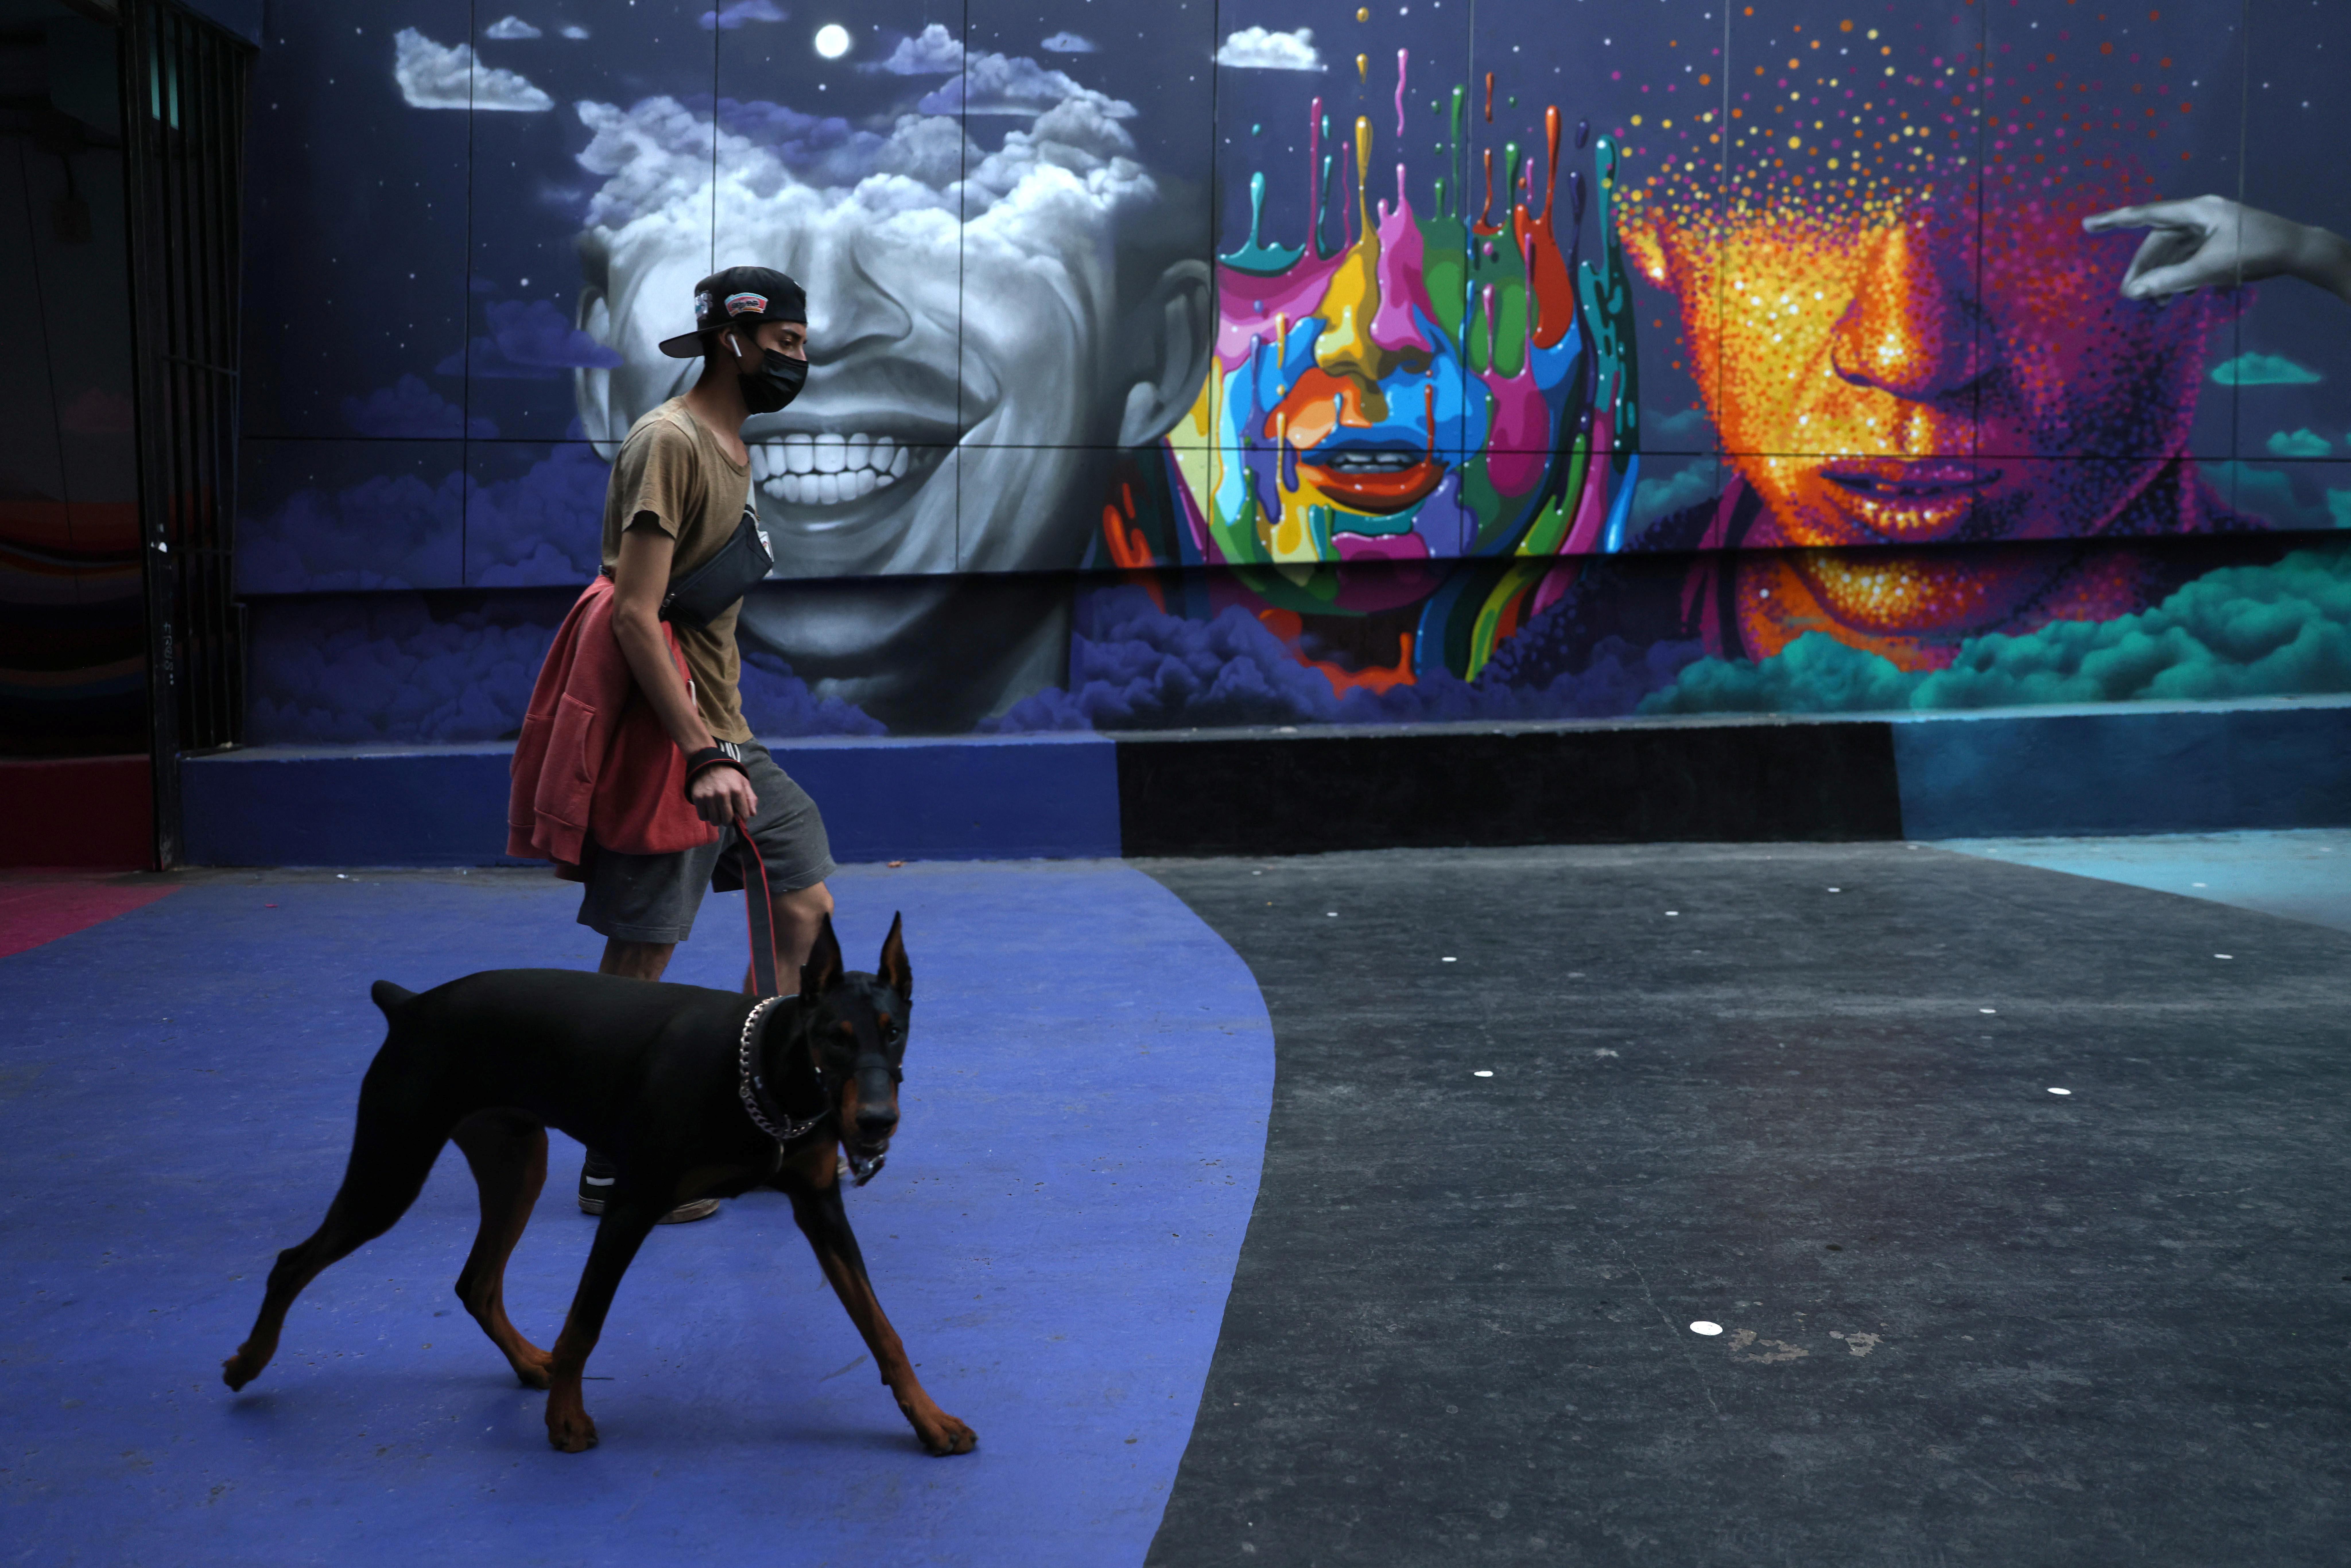 A man walks a dog as lockdown restrictions increase during the coronavirus disease (COVID-19) outbreak, in Santiago, Chile, March 31, 2021. REUTERS/Ivan Alvarado